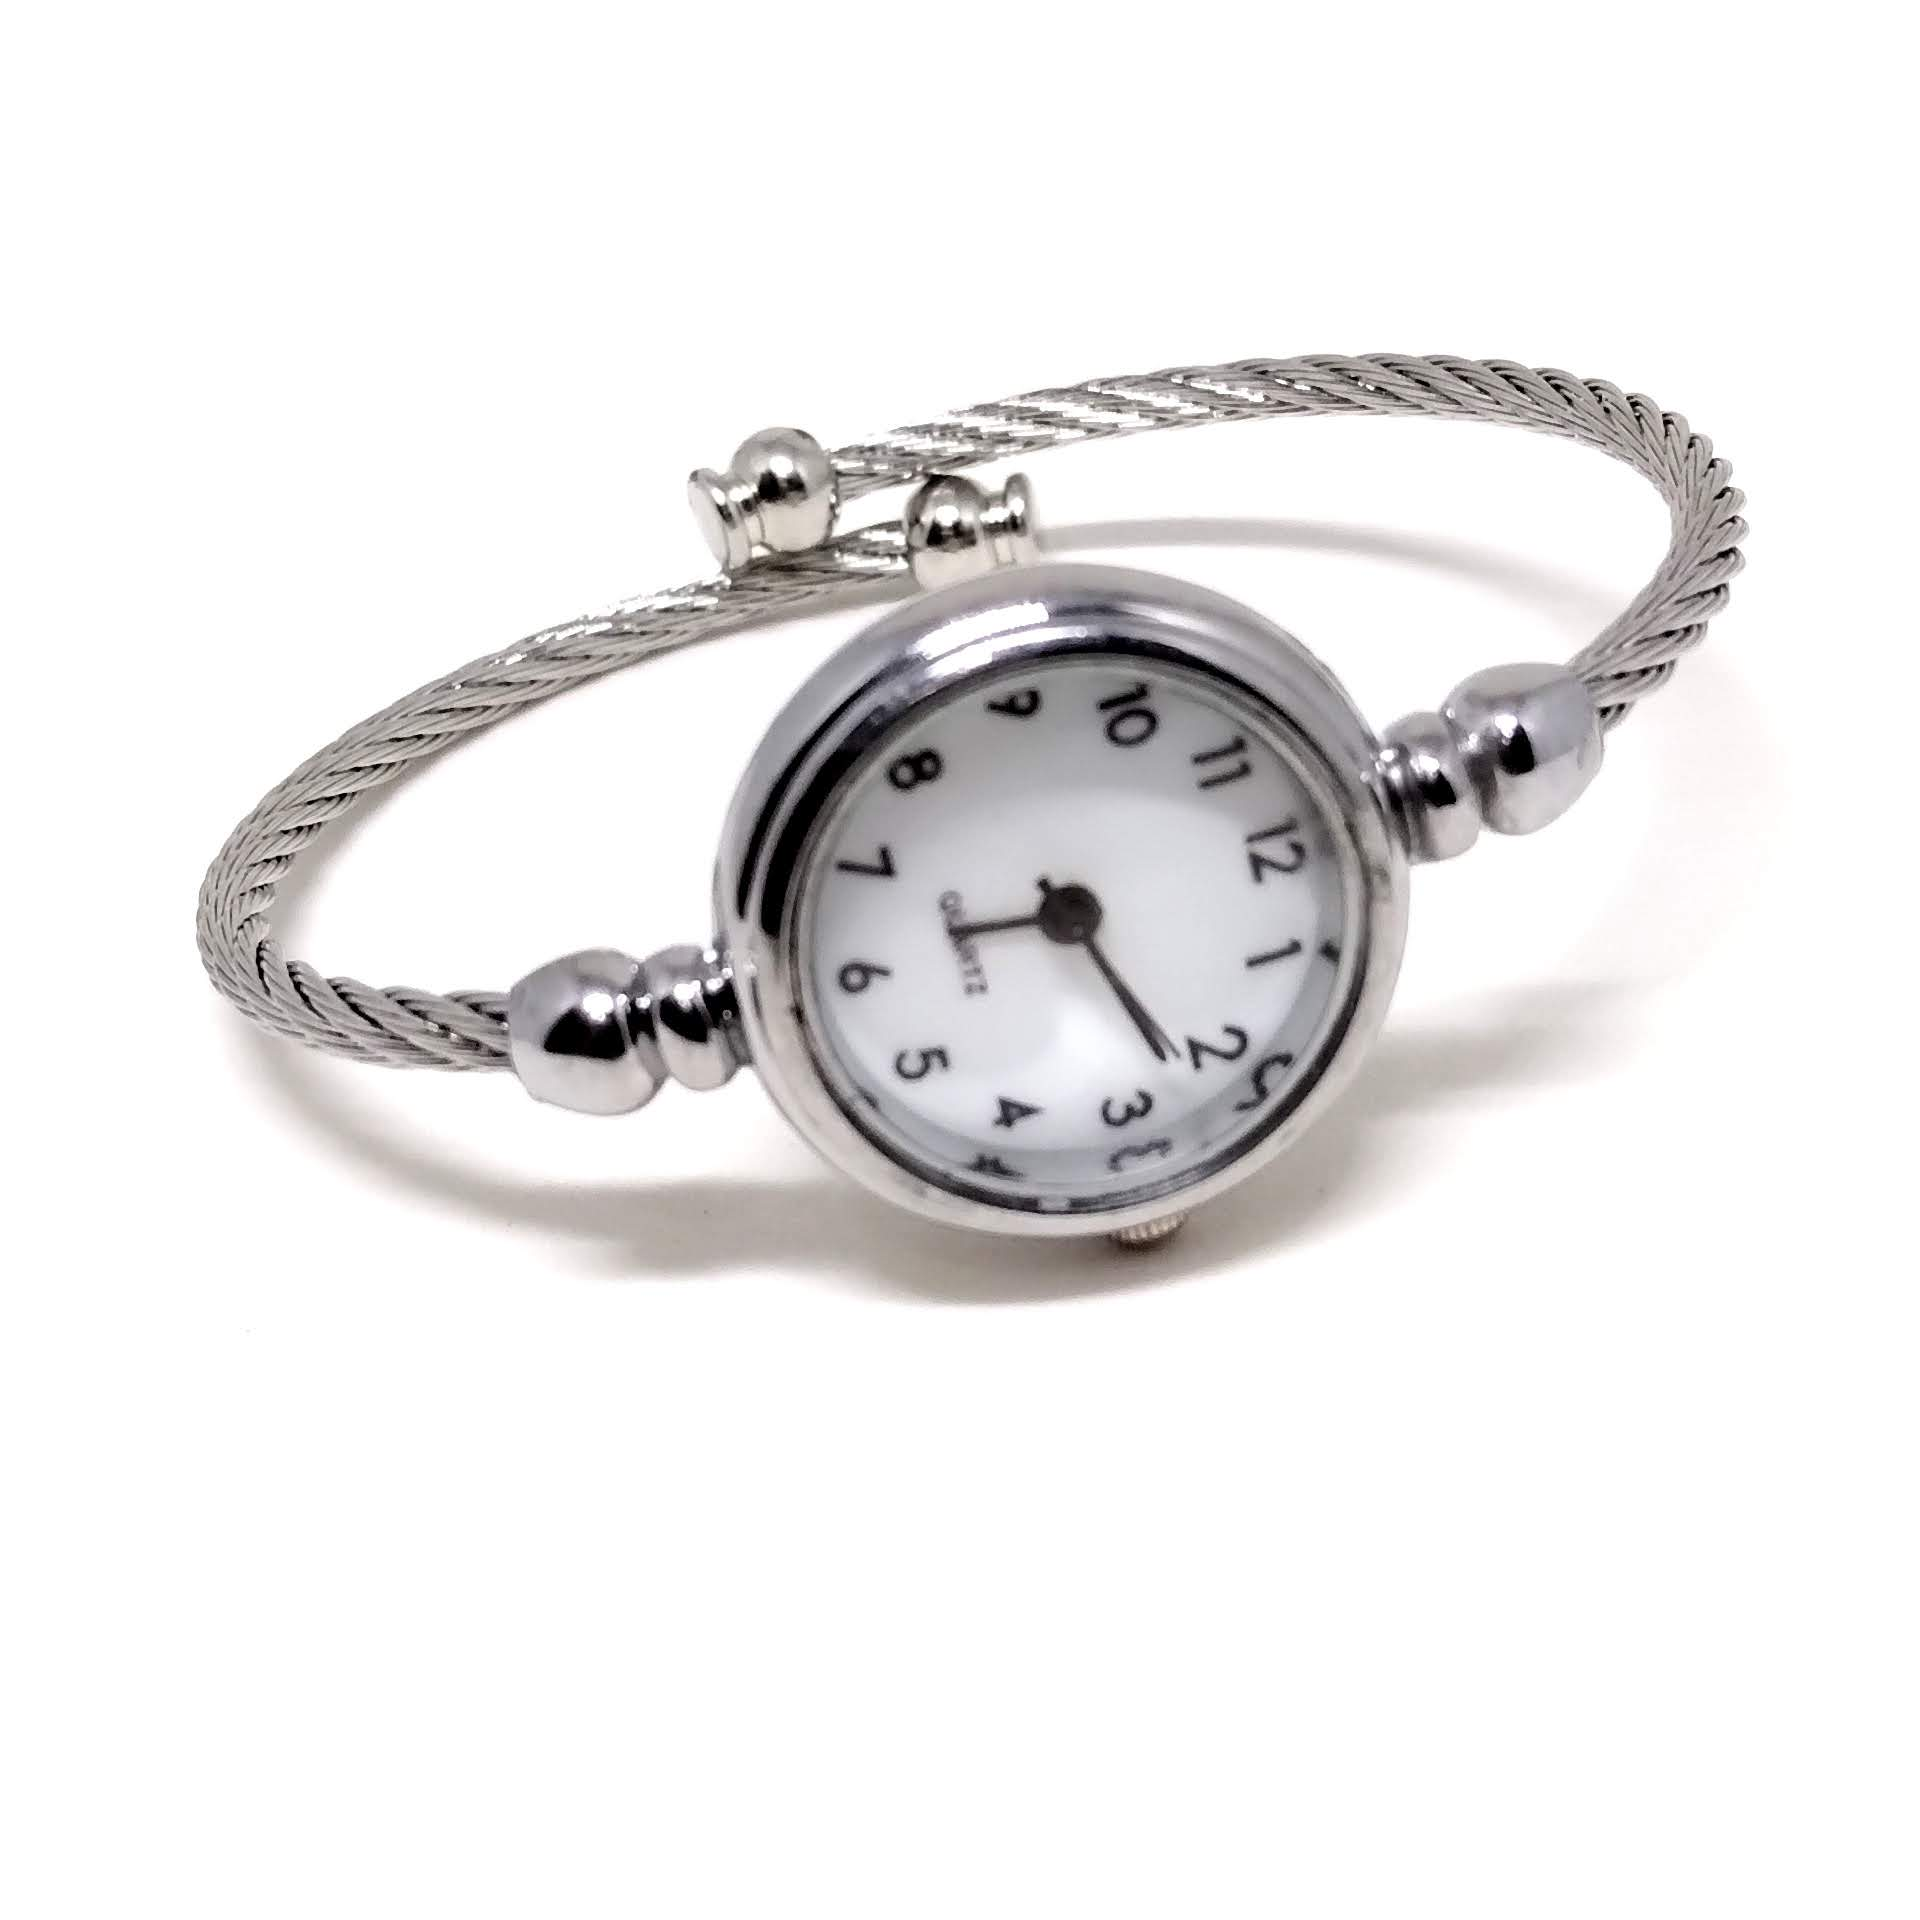 Relógio Feminino Minimalista com Número Lova